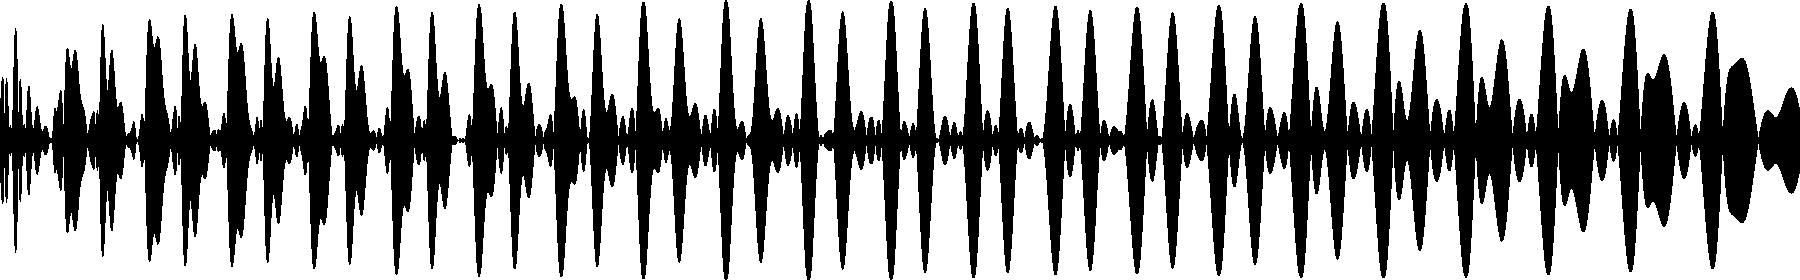 vedh bass cut 025 g